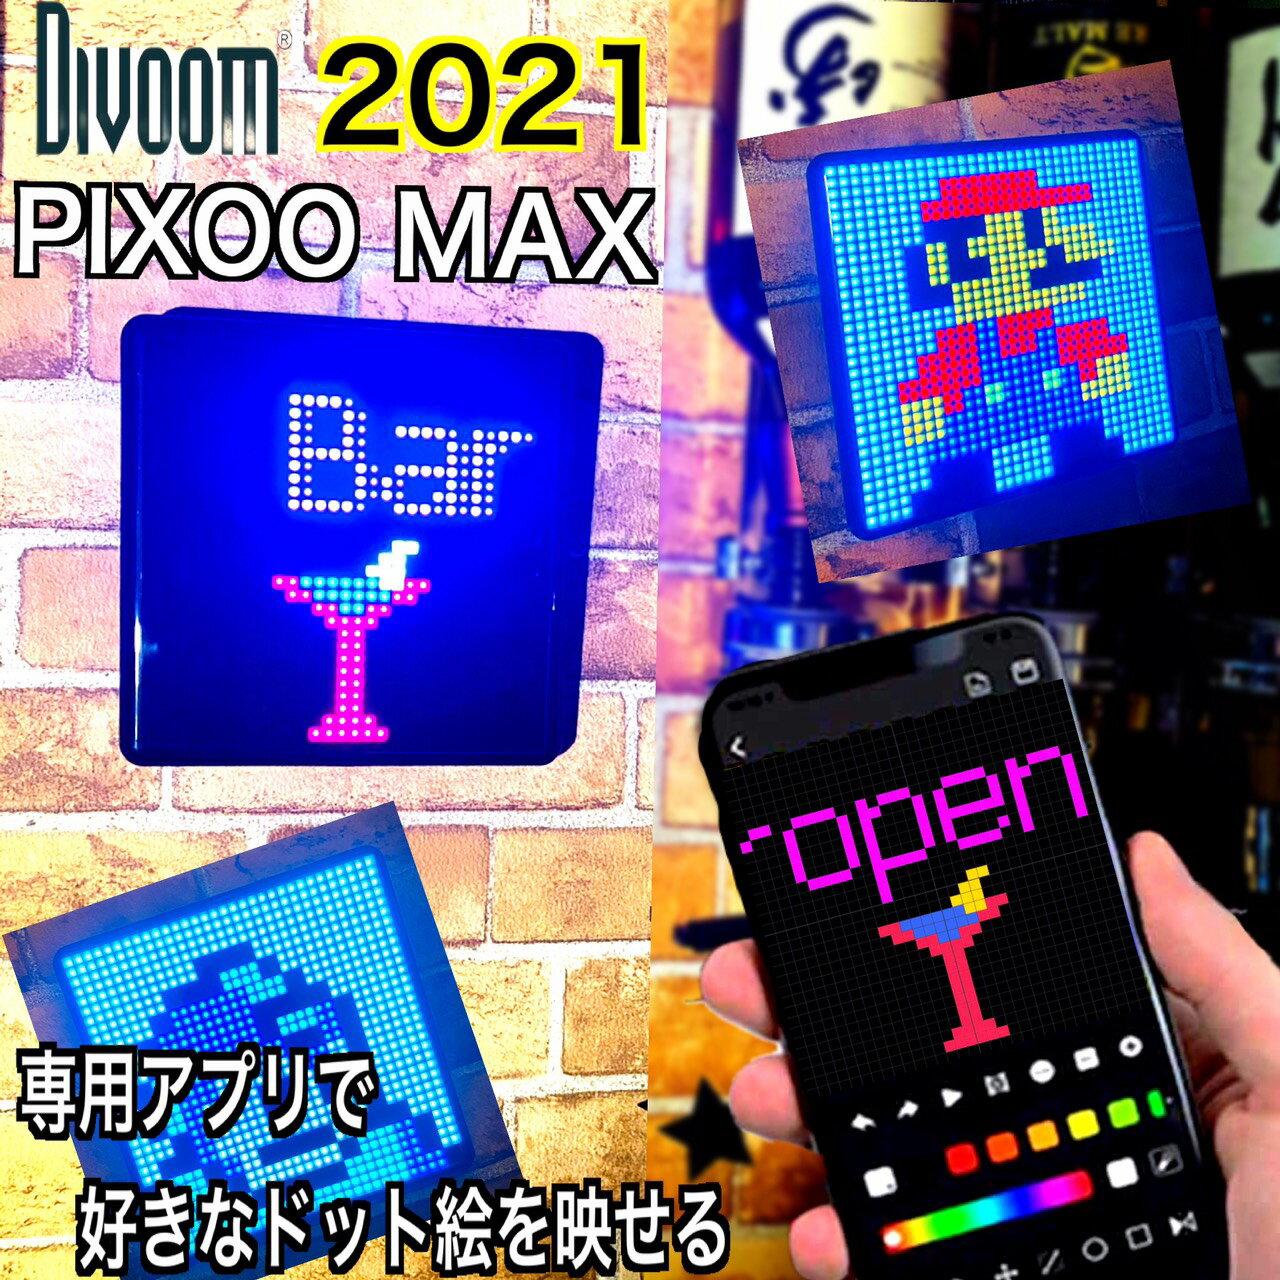 TV・オーディオ・カメラ, その他 DIVOOM PIXOO MAX DIV-PXMAX-BK LED SNS